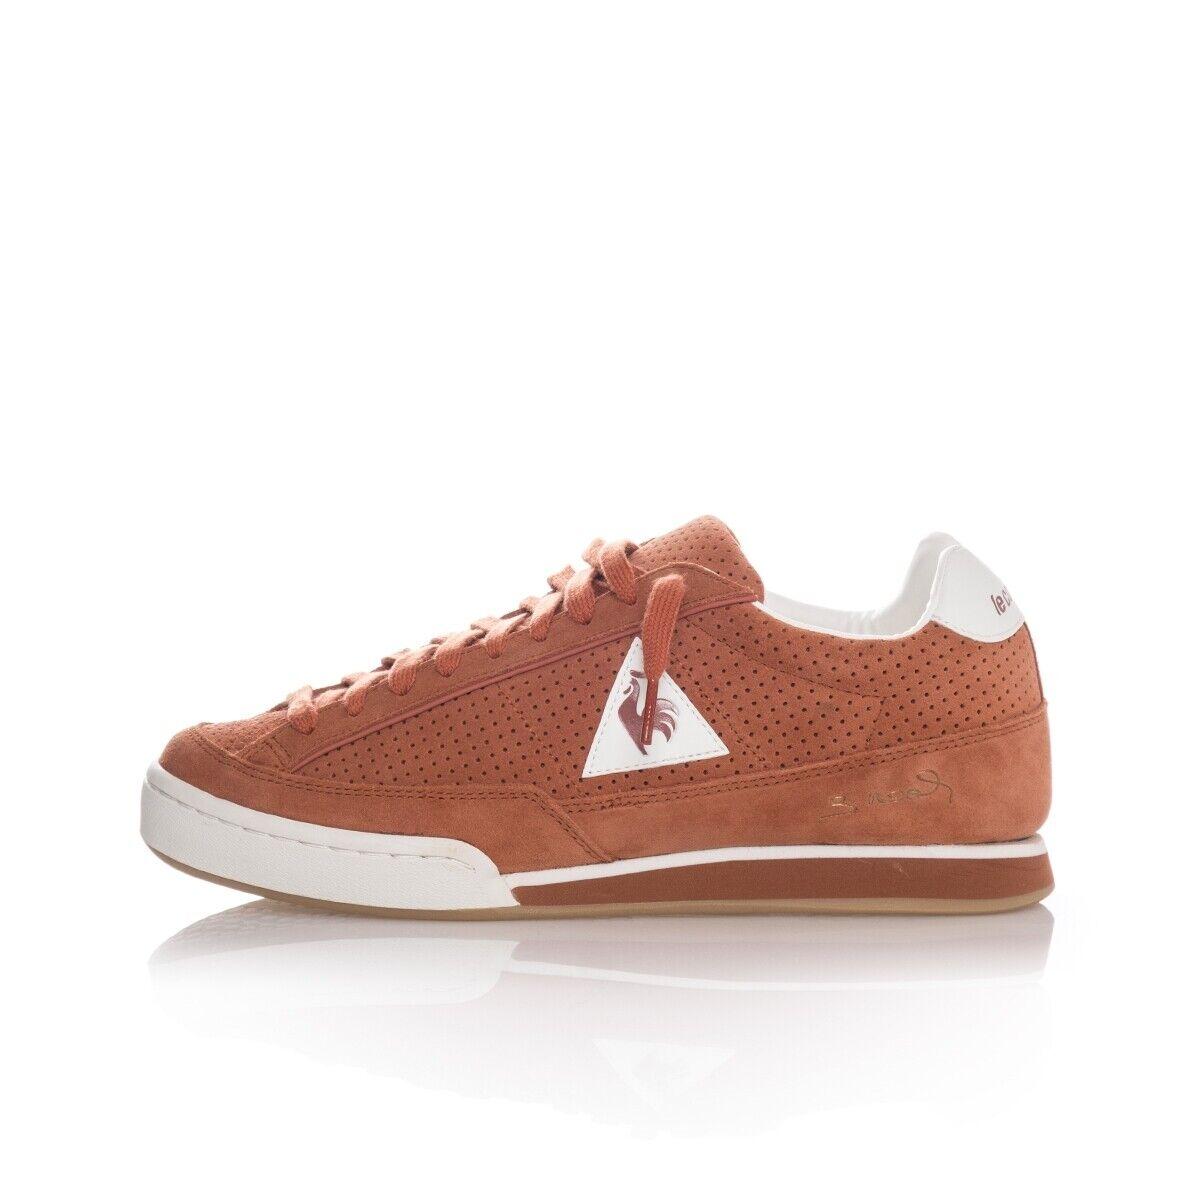 Zapatos hombre LE COQ SPORTIF NOAH CLUB TERRE pegada 1820400 Zapatillas LE COQ SPORTIF